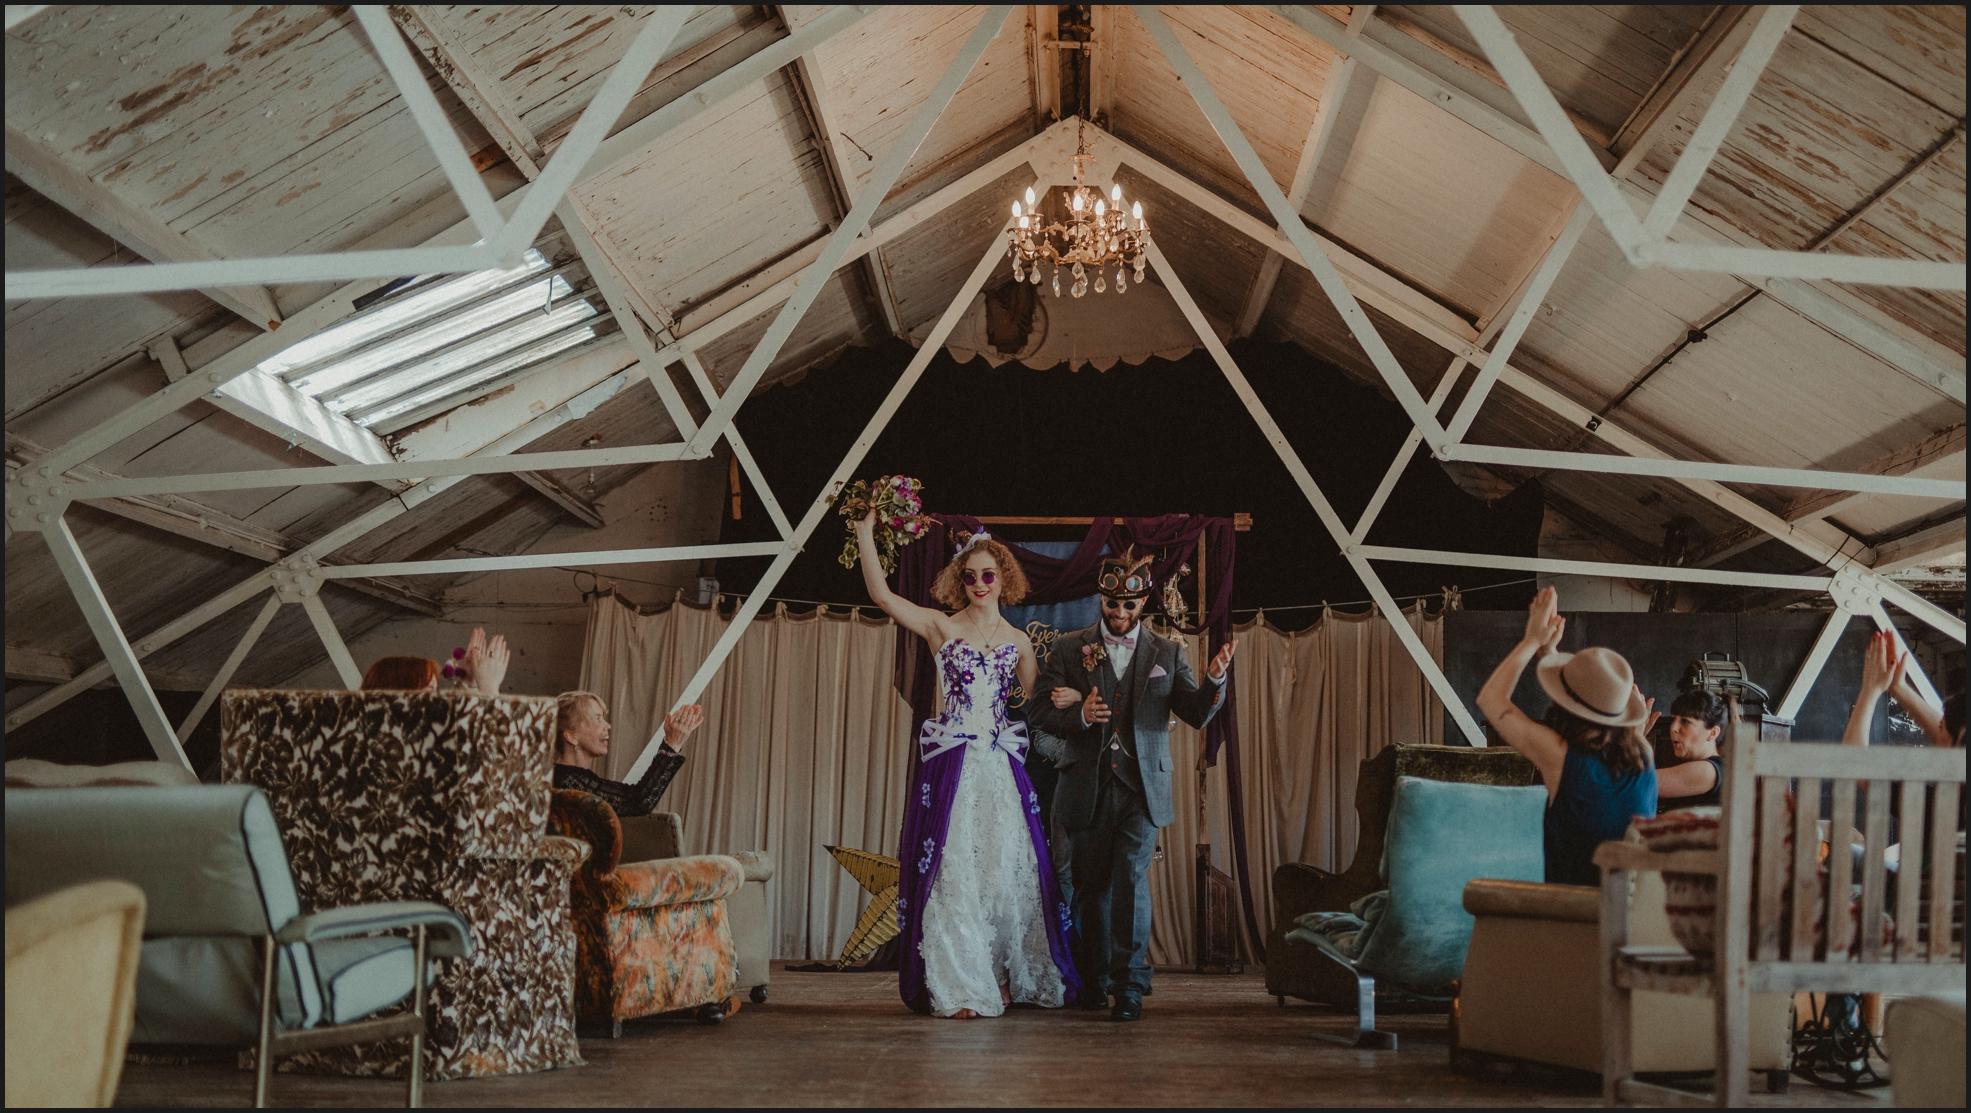 ceremony, wedding ceremony, bride, groom, celebrant, Dalston Heights, London, Steampunk, happy, smiles, couple, funny